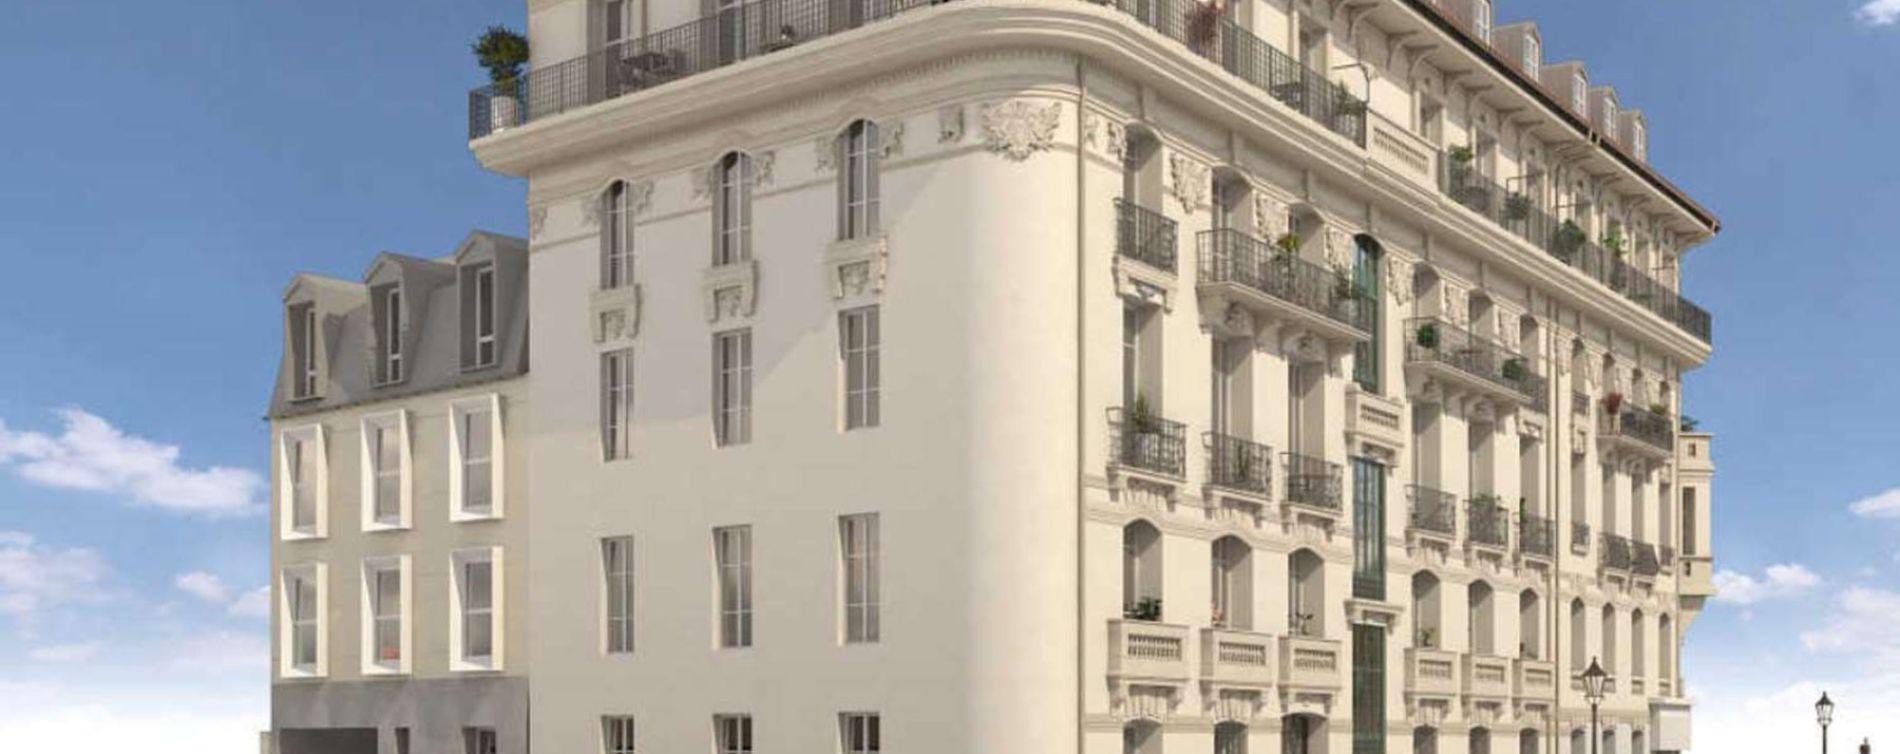 Résidence Le Malaussena - Neuf à Nice